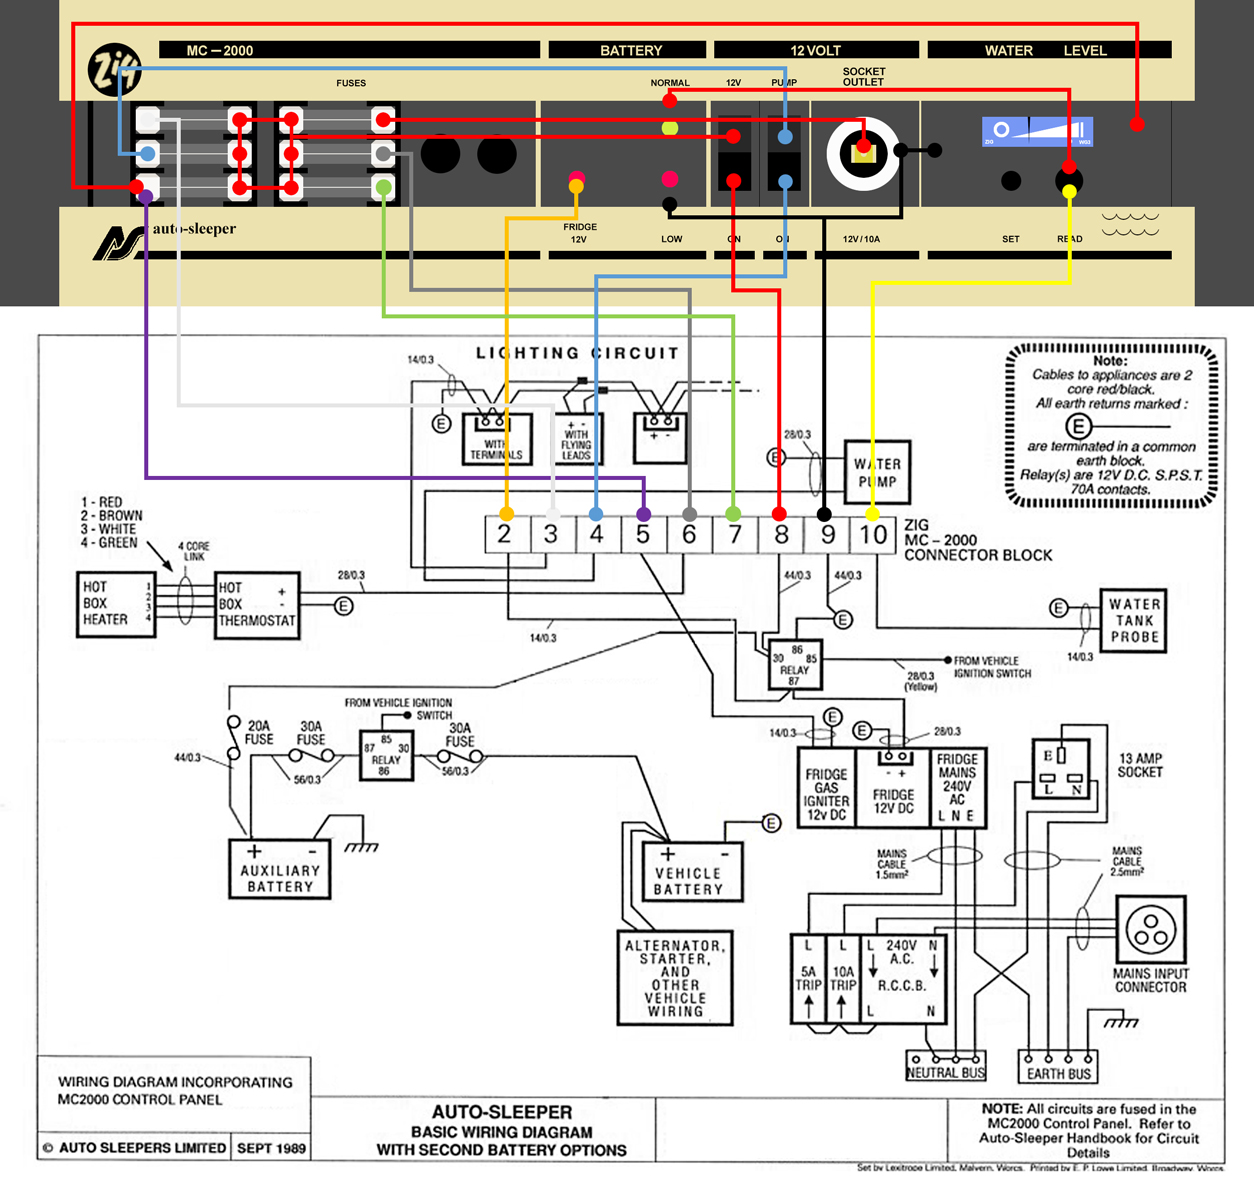 hight resolution of mc wiring diagram wiring diagram expert wiring diagram programs mc